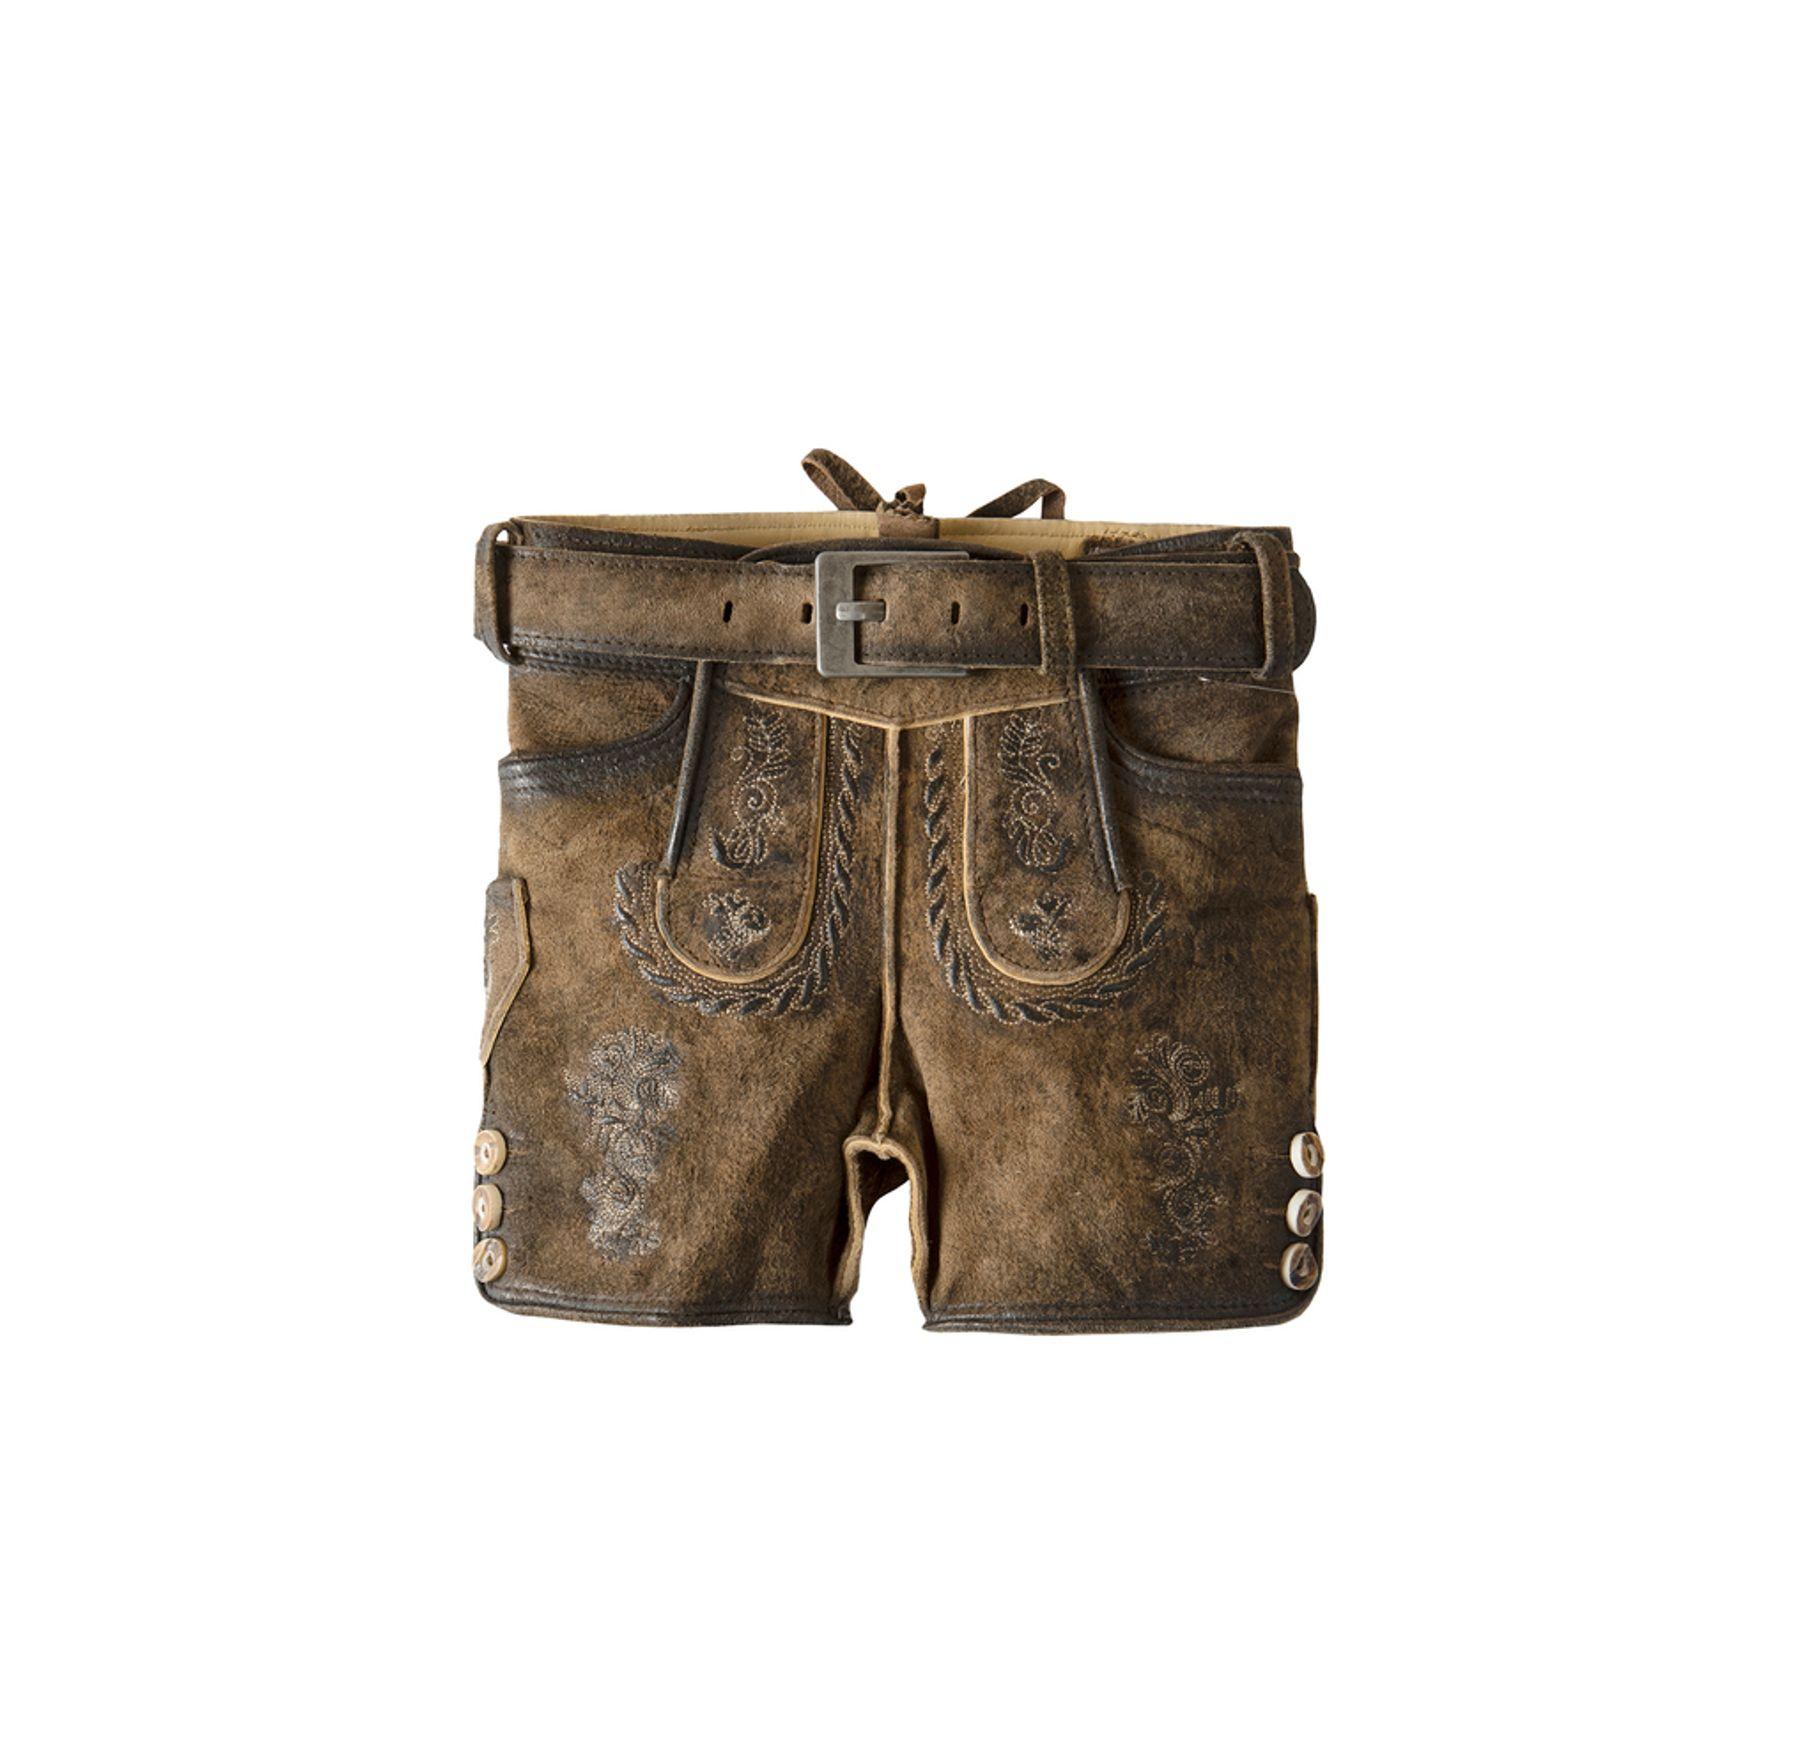 Stockerpoint - Kinder Trachten Lederhose mit Gürtel, Moritz Gr:122-152 – Bild 2